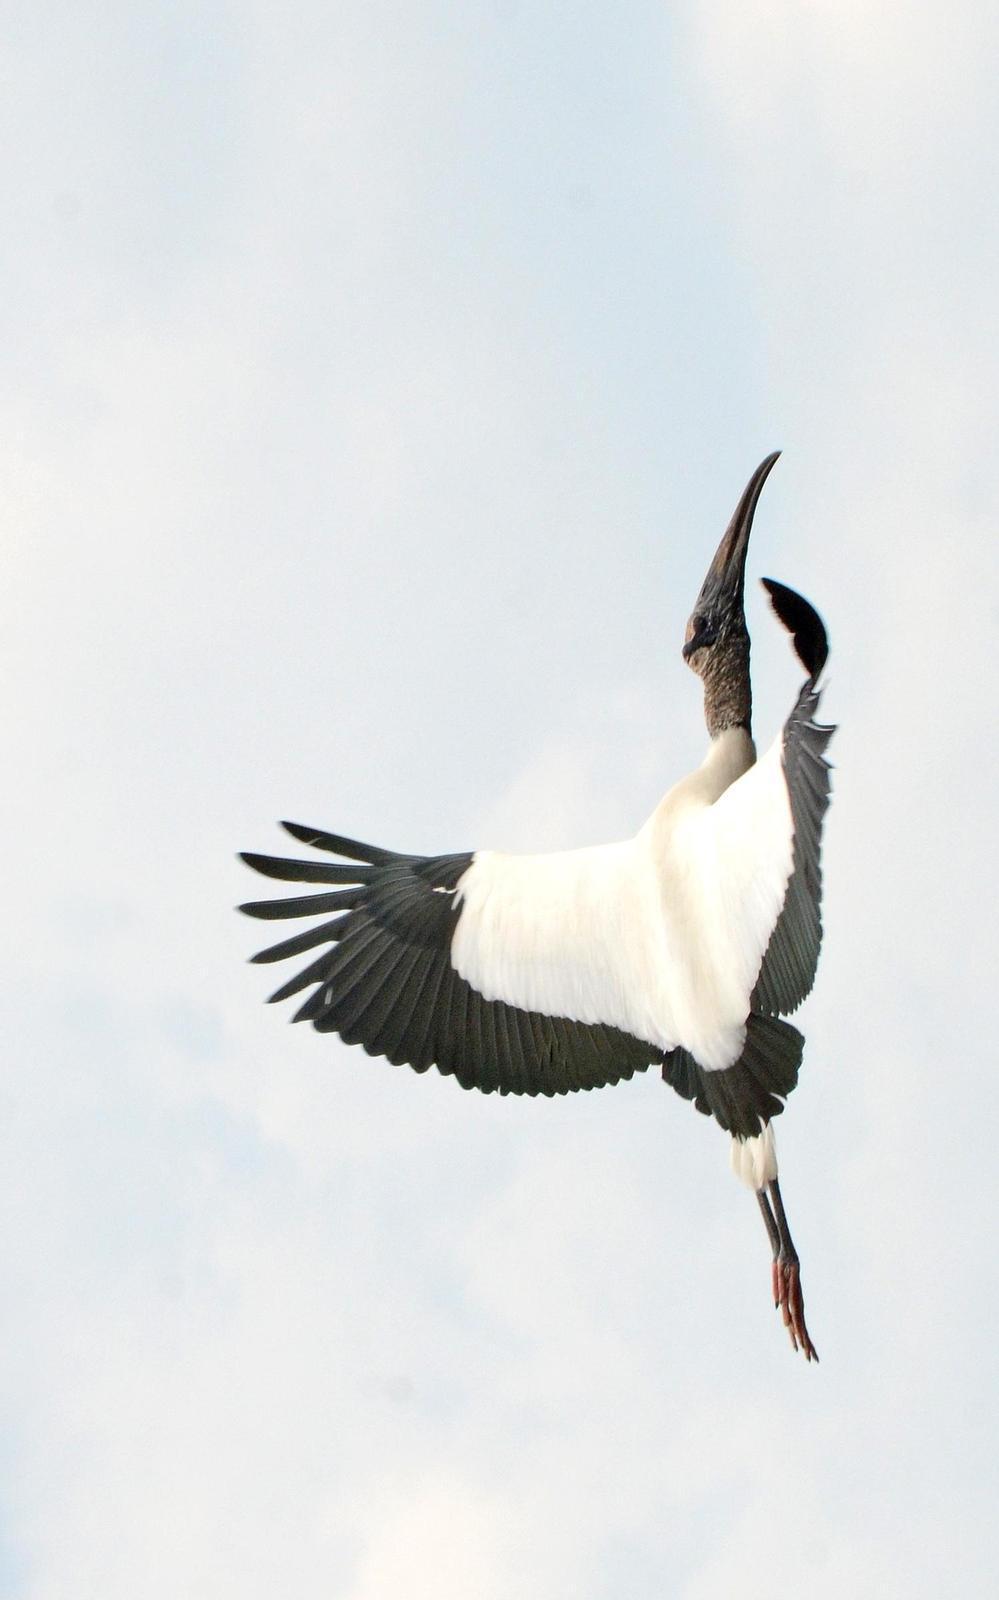 Wood Stork Photo by Steven Mlodinow